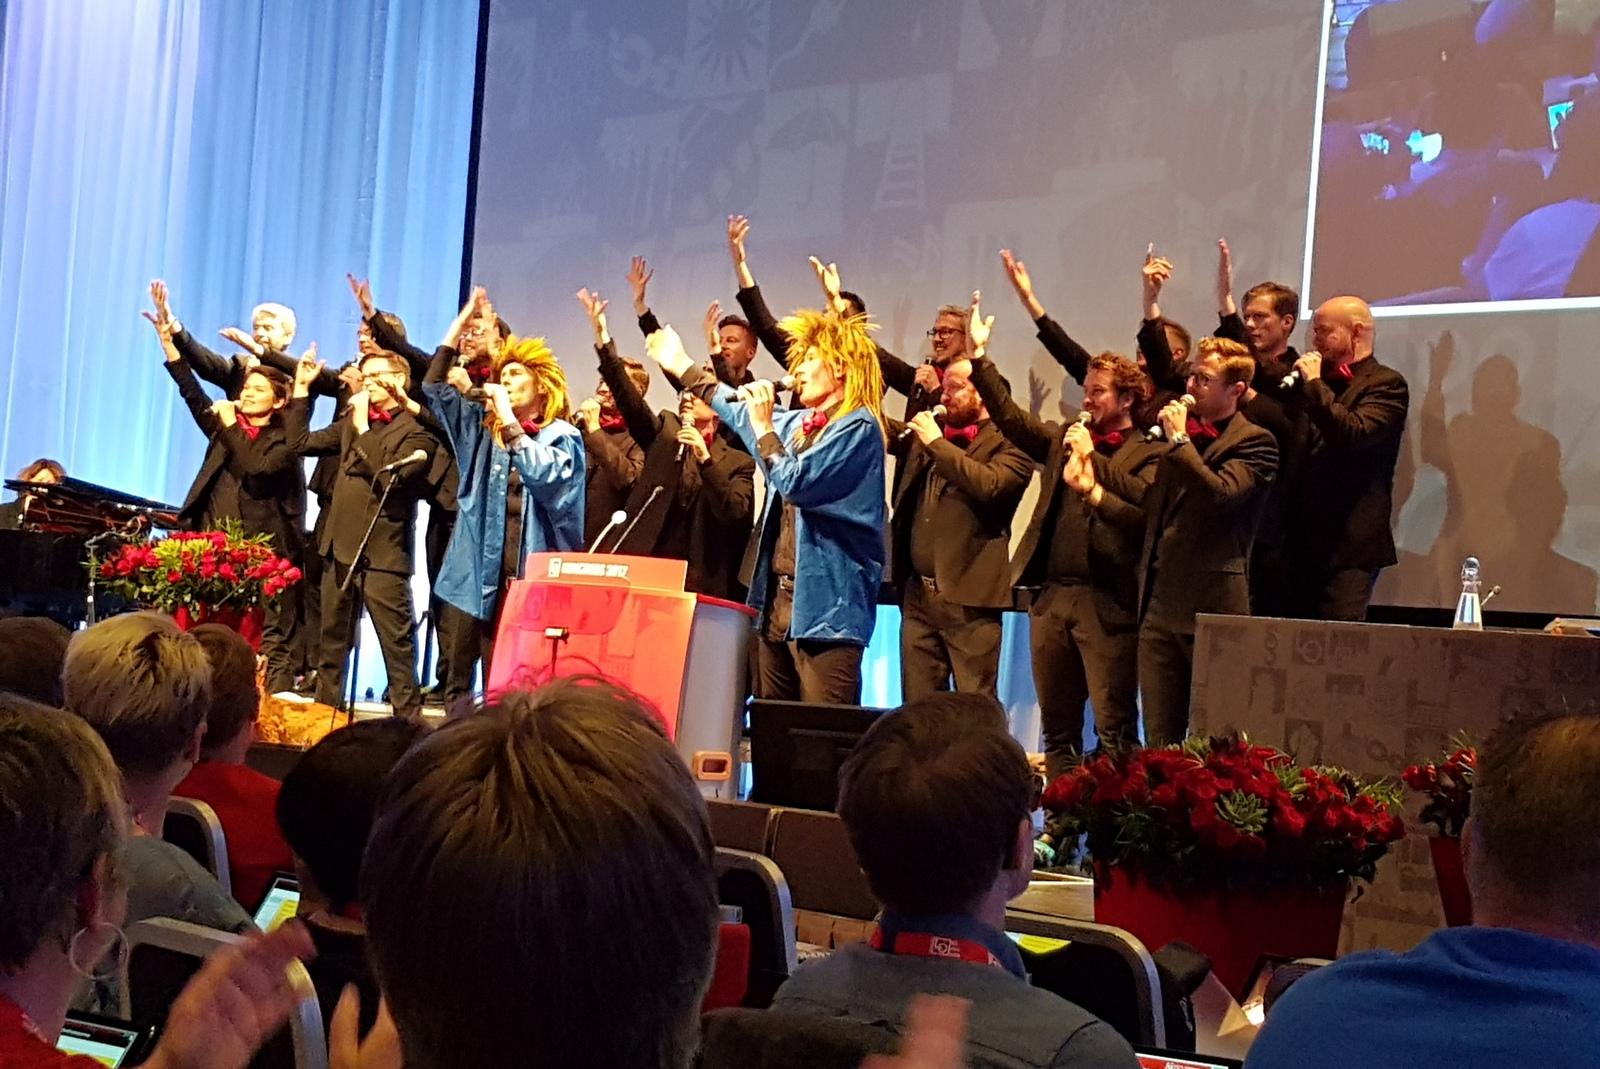 Oslo fagottkor underholdt på LO kongressen